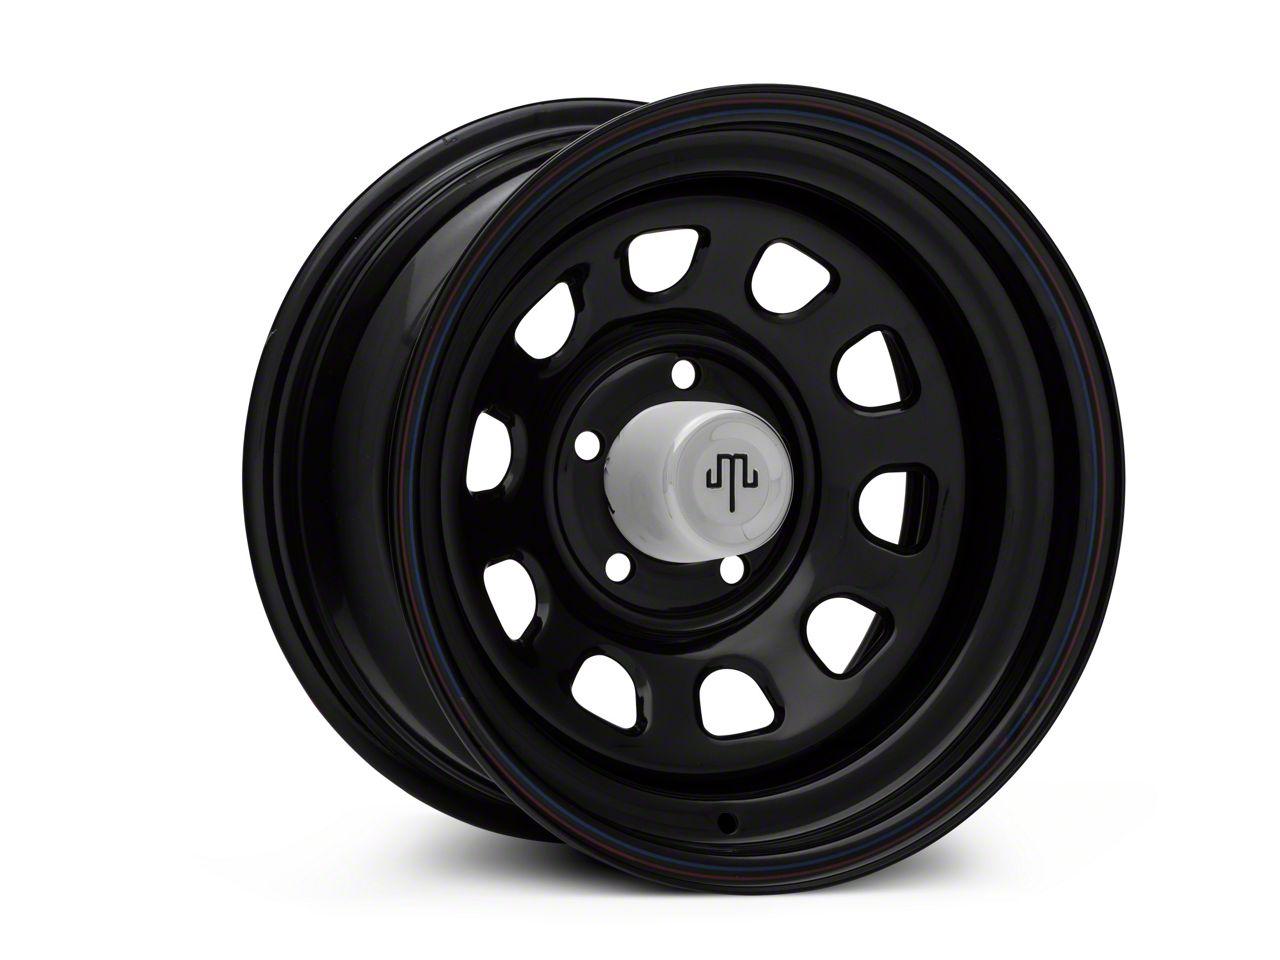 Mammoth D Window Black Wagon Wheel Edition Steel Wheel 15x8 Wheel & Mickey Thompson Baja MTZP3 31x10.50R15 Tire Kit (87-06 Jeep Wrangler YJ & TJ)